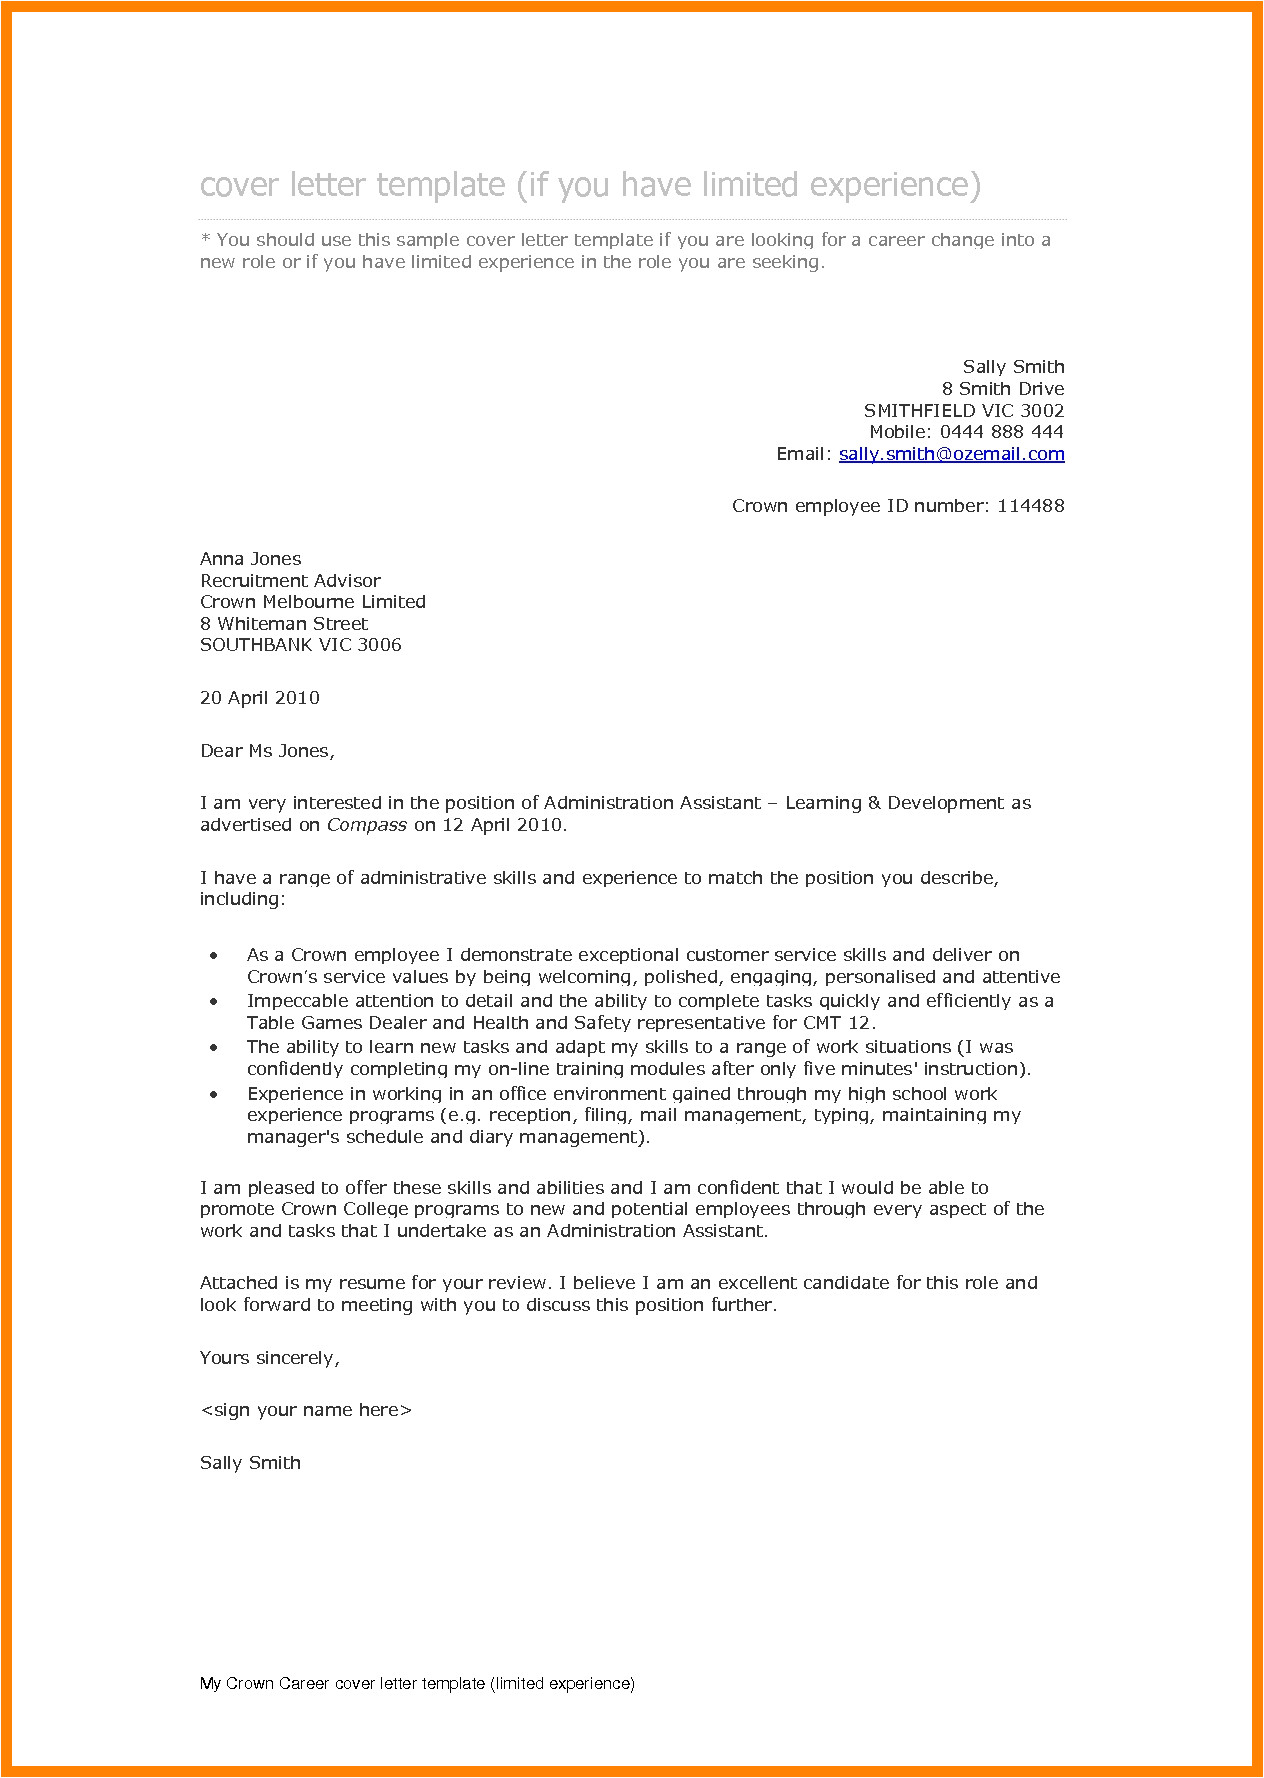 6 arrangement of application letter for position